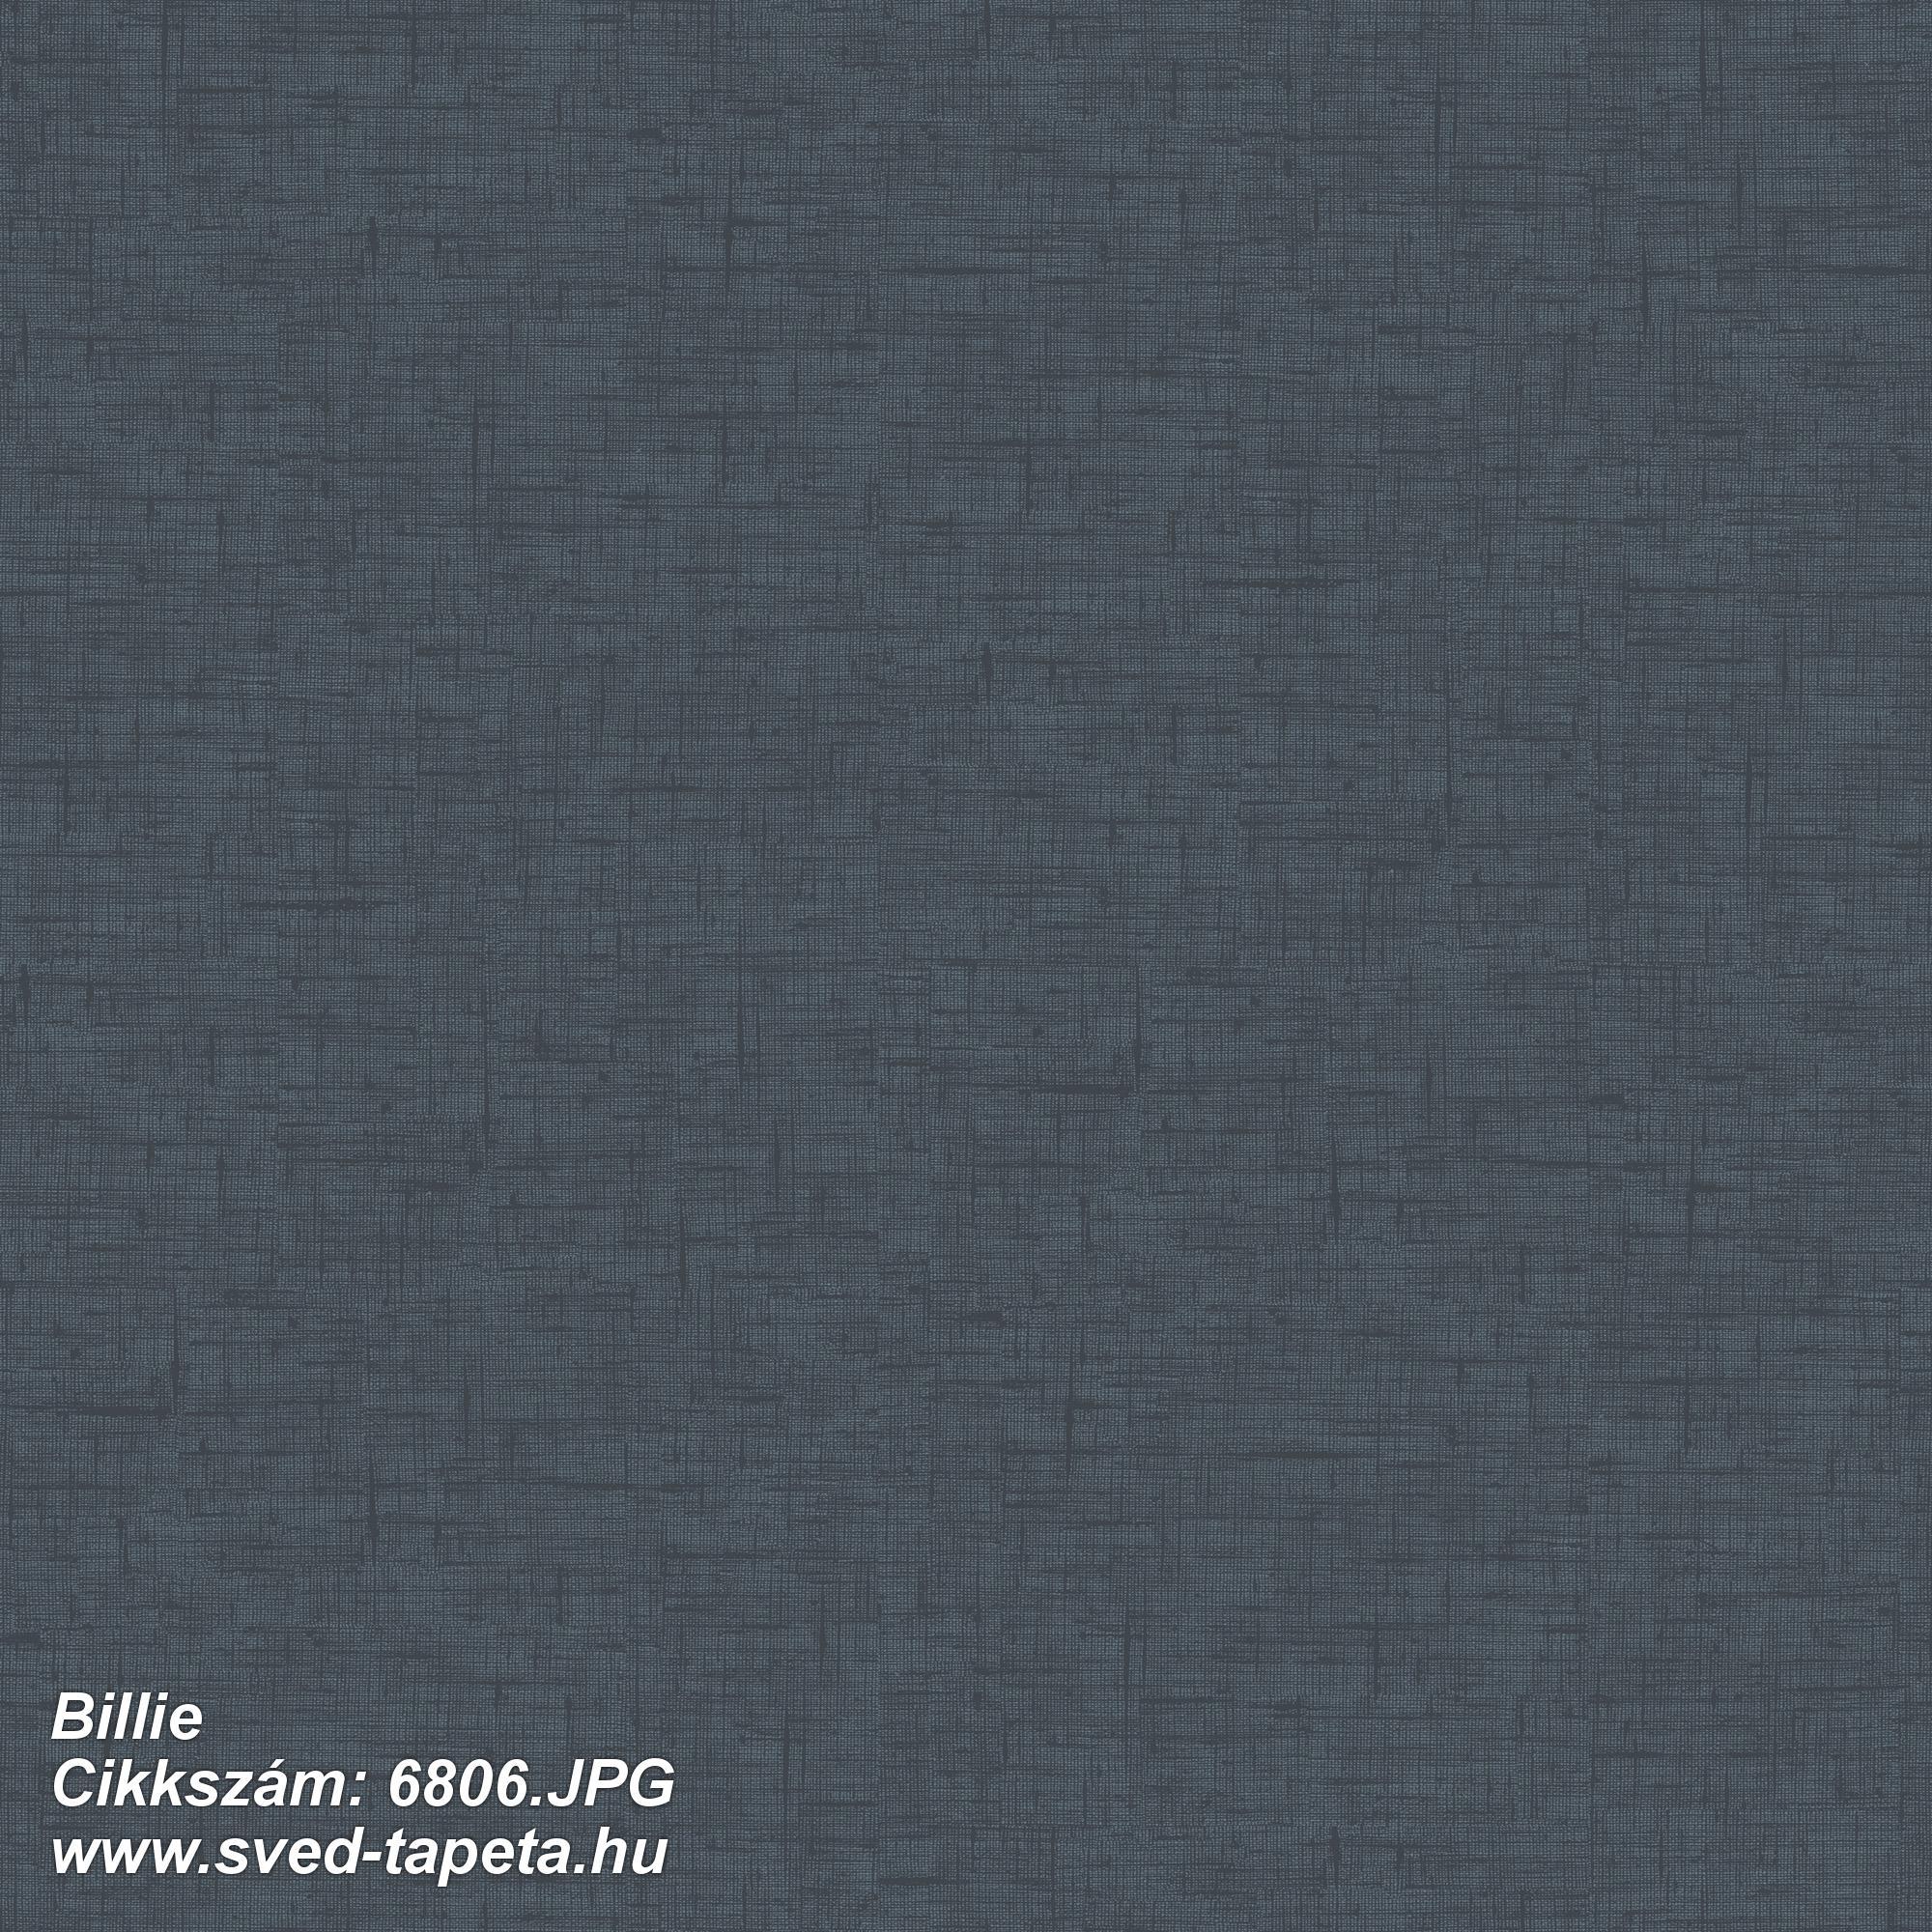 Billie 6806 cikkszámú svéd Borasgyártmányú designtapéta